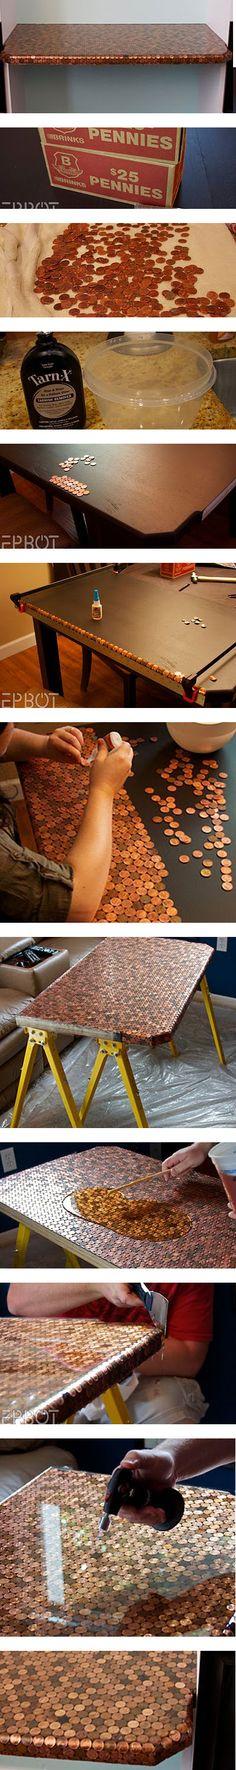 Money Money Money  http://www.epbot.com/2010/09/money-money-money.html